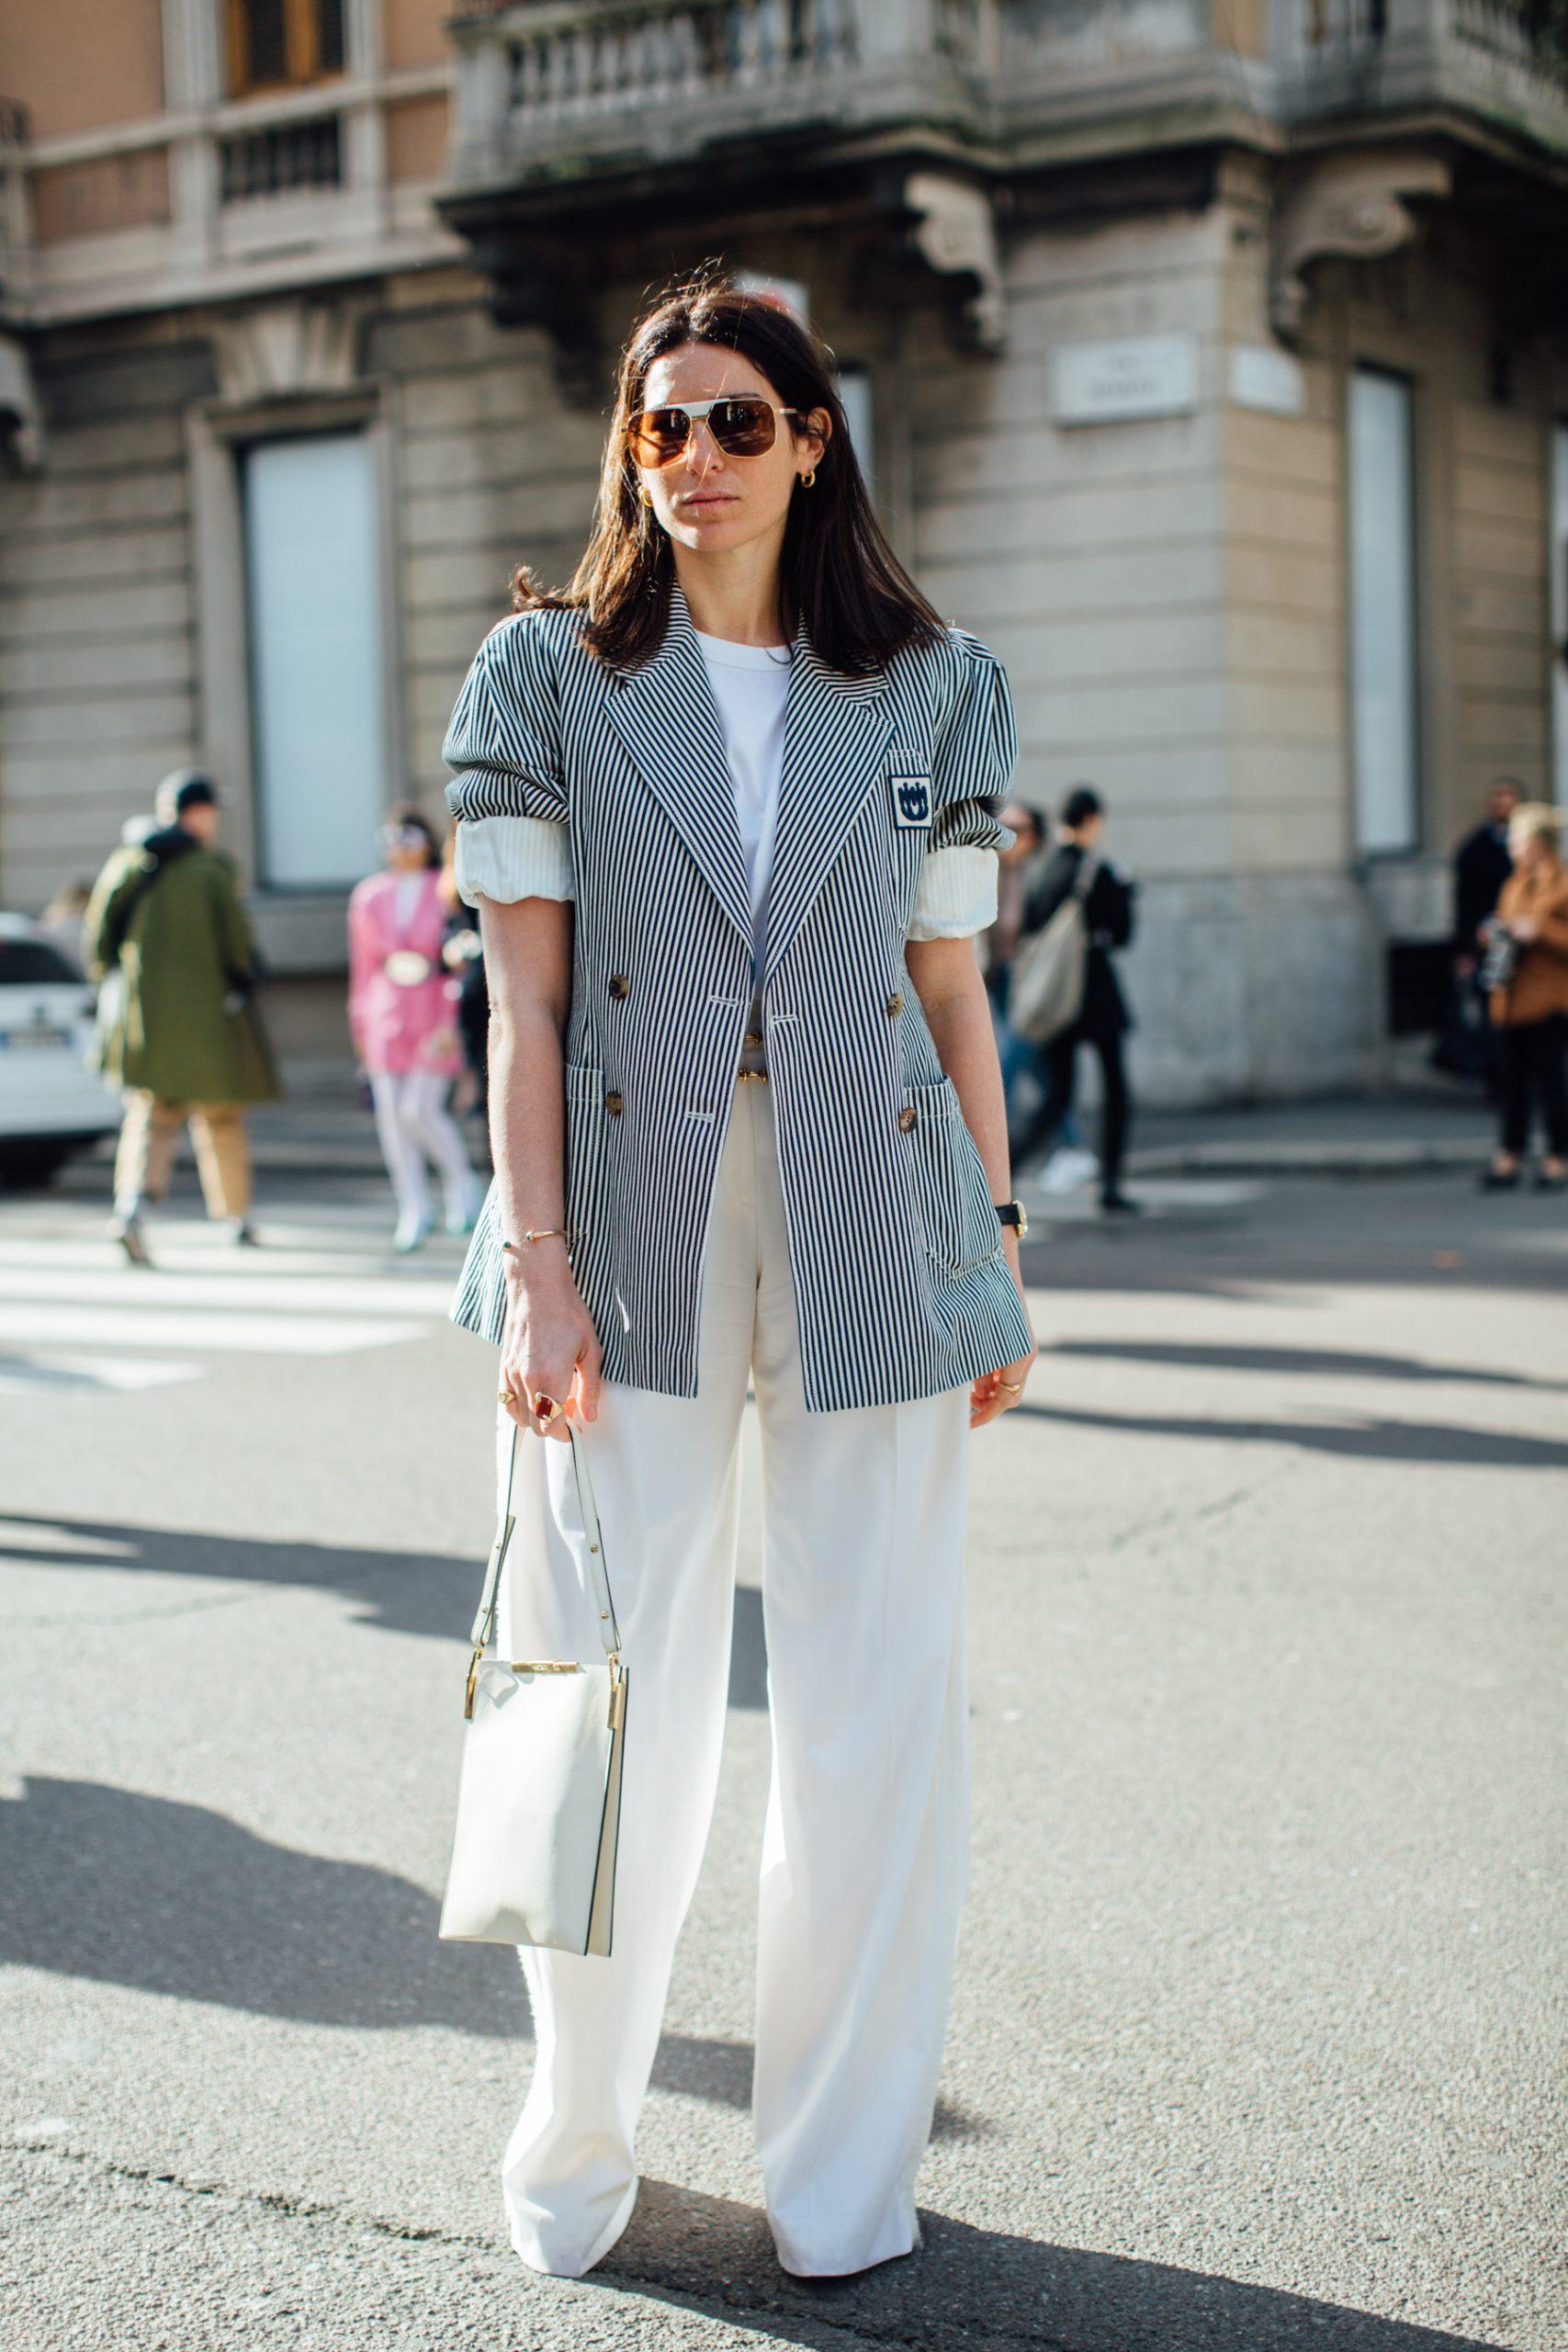 Milan Fashion Week Fall 2020 Street Style Photos